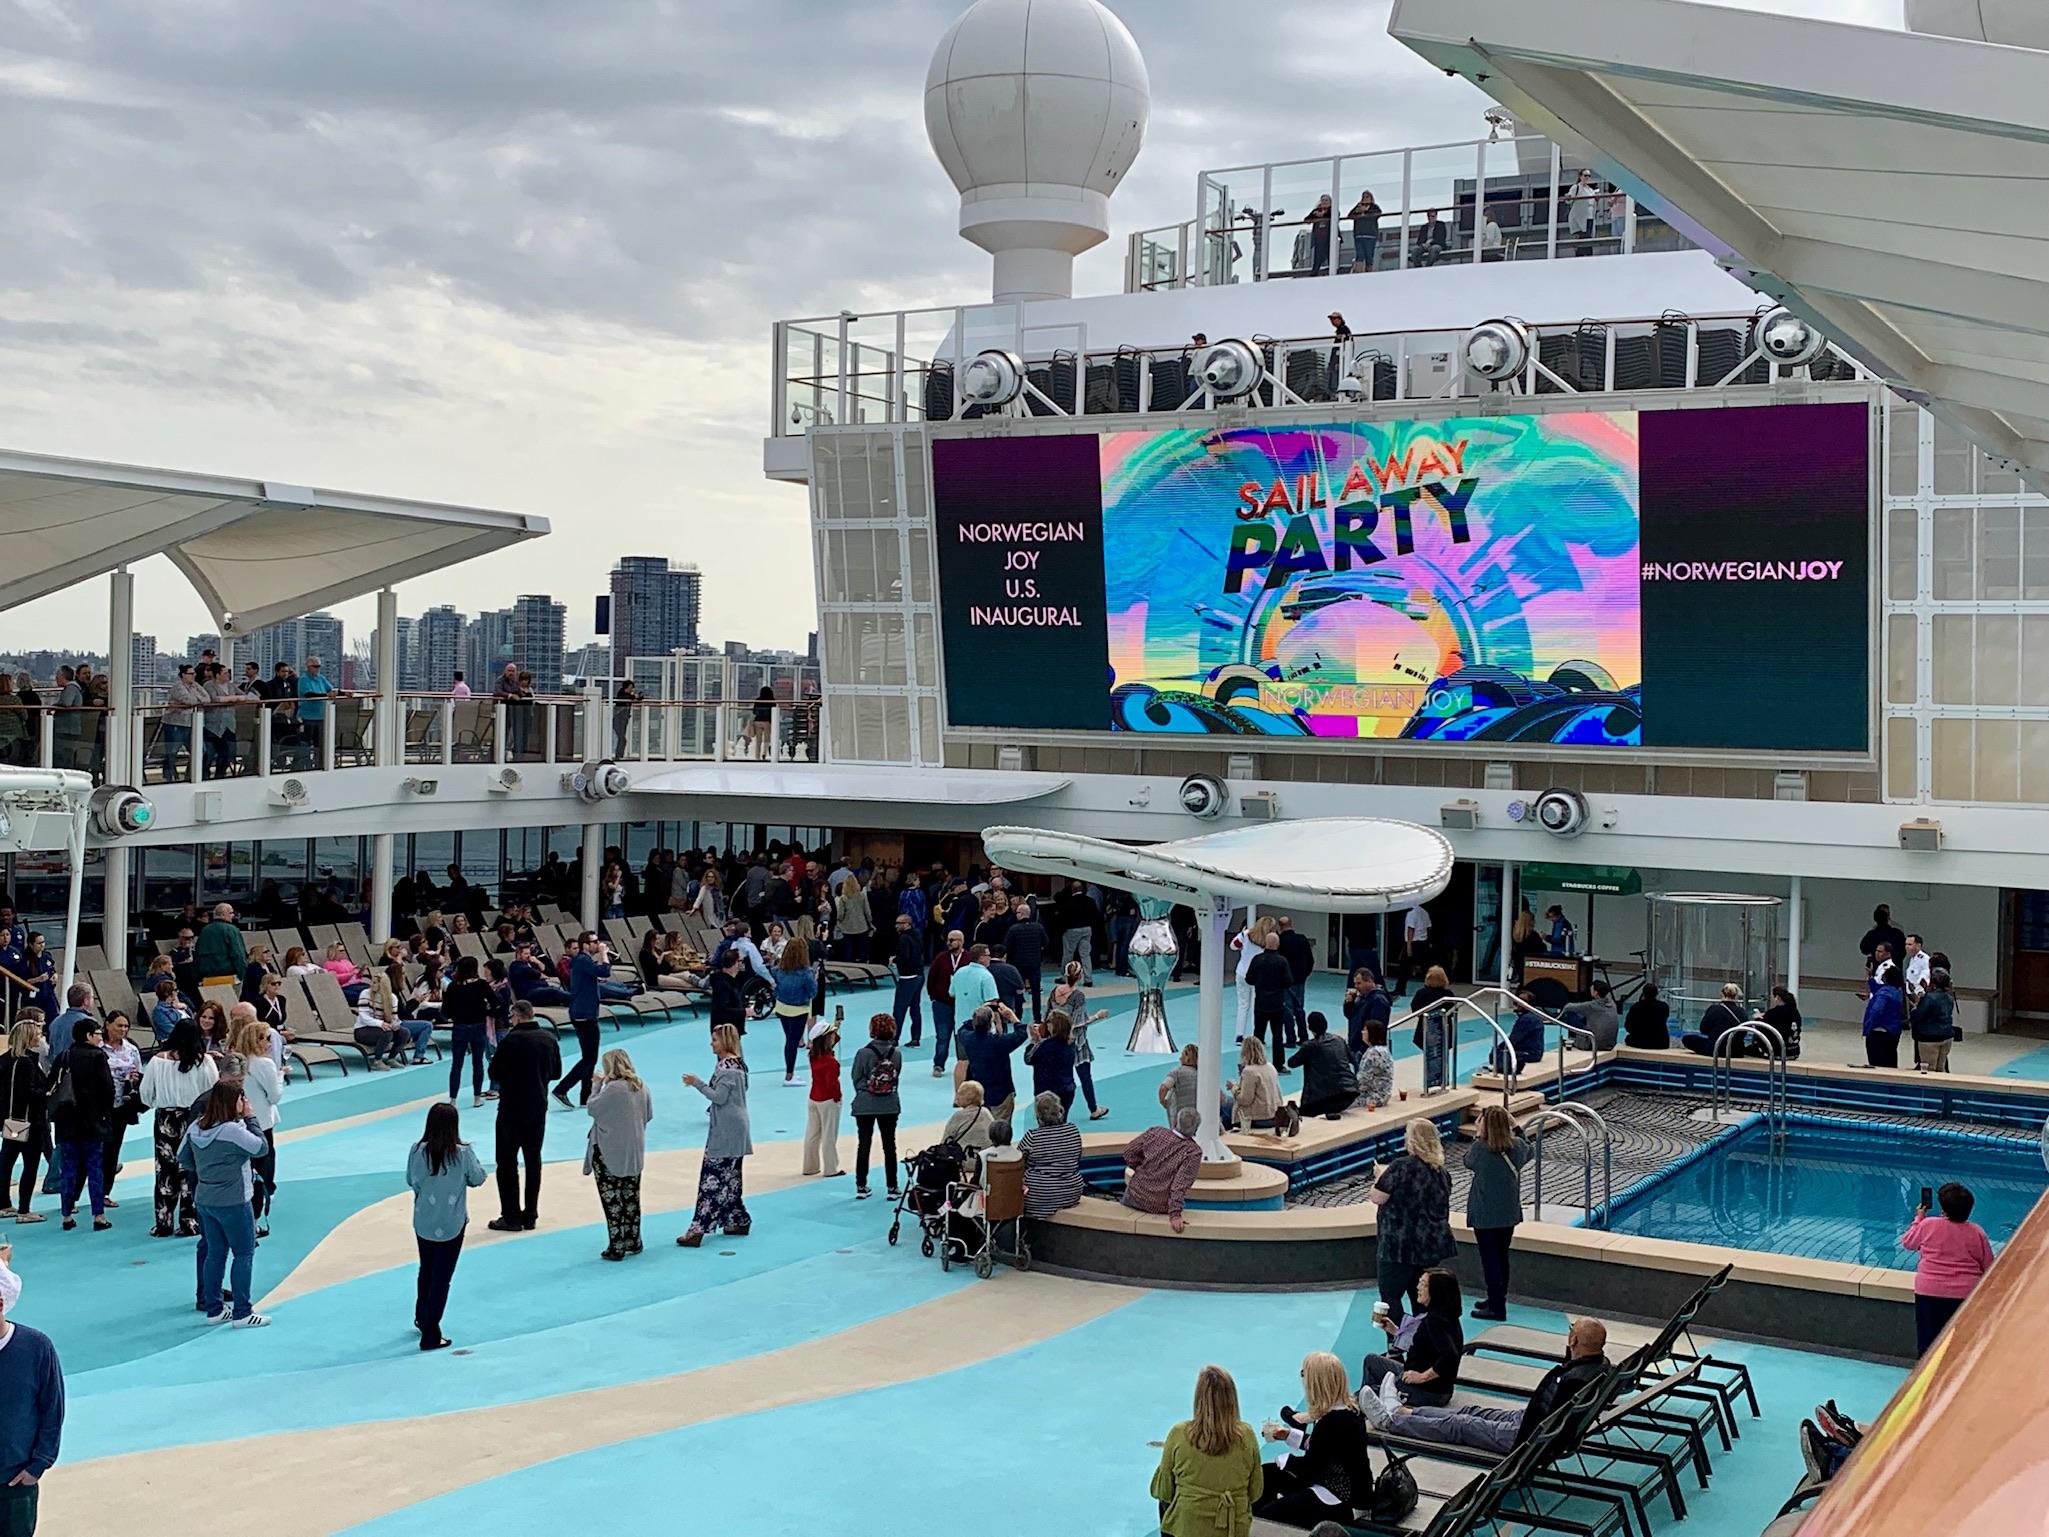 NCL Joy Pool Deck Big Screen